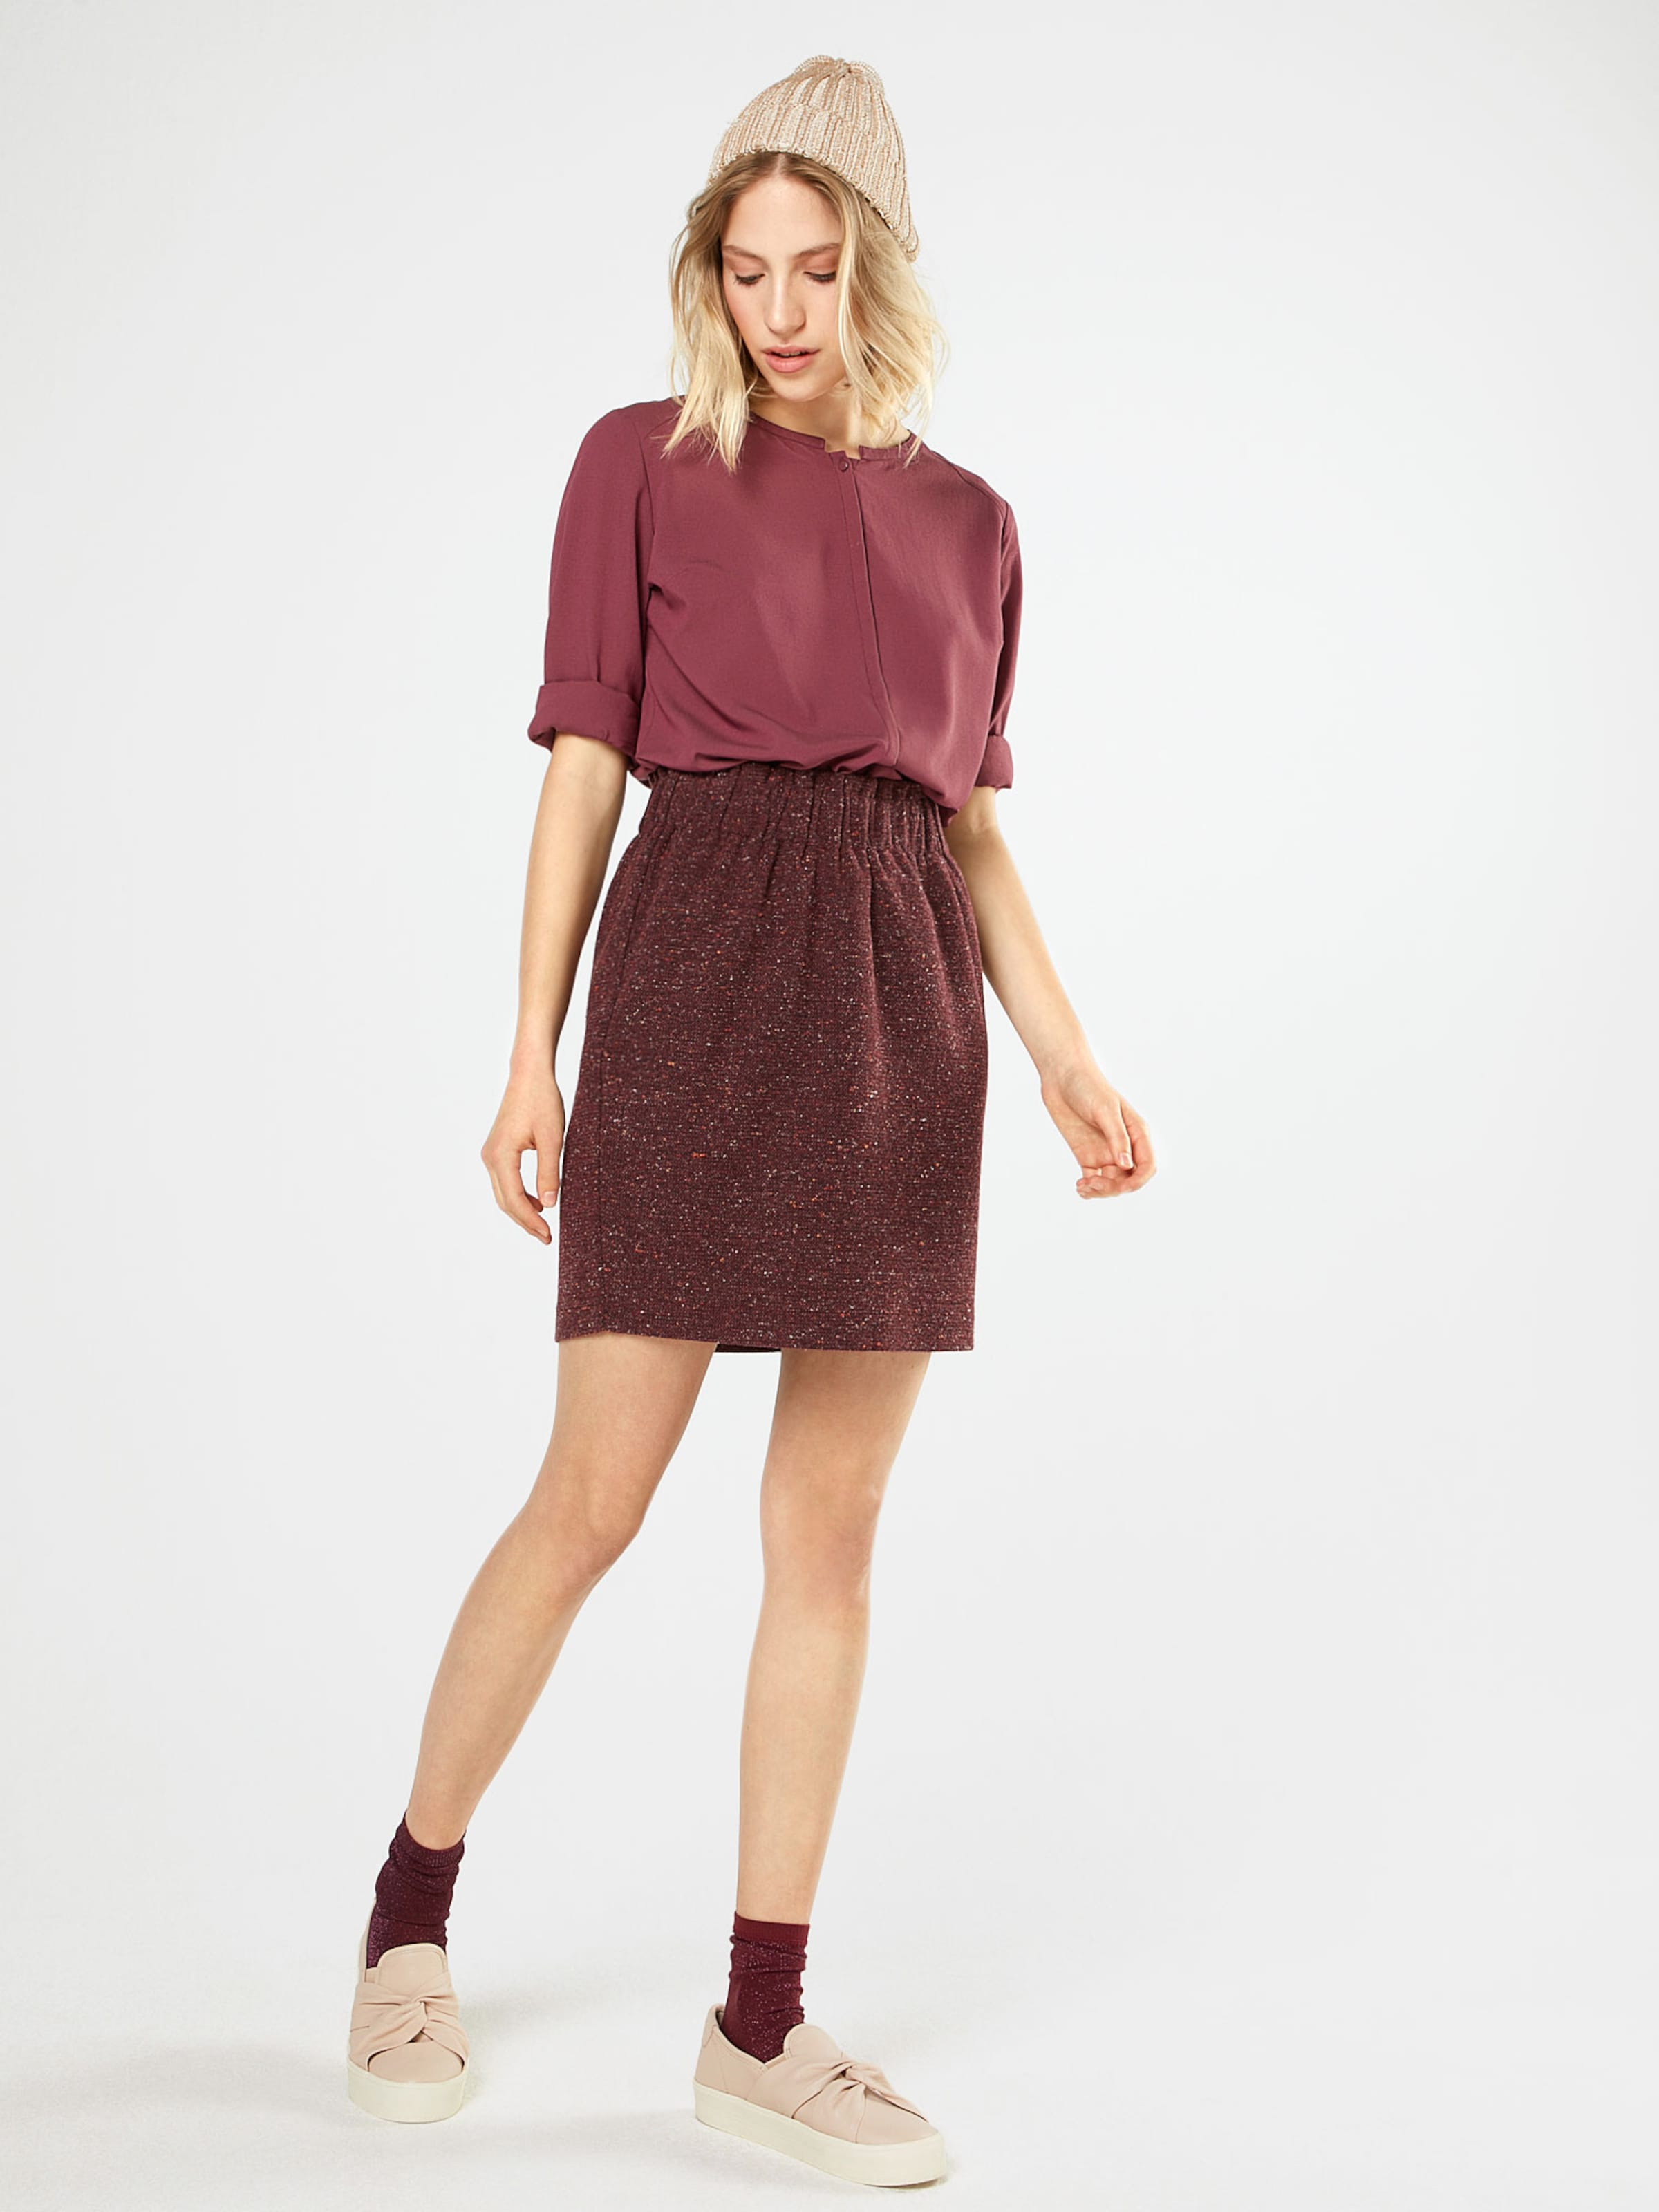 NÜMPH Minirock 'UGNI' Verkauf Des Niedrigen Preises Online Rabatt Mode-Stil lKrwr